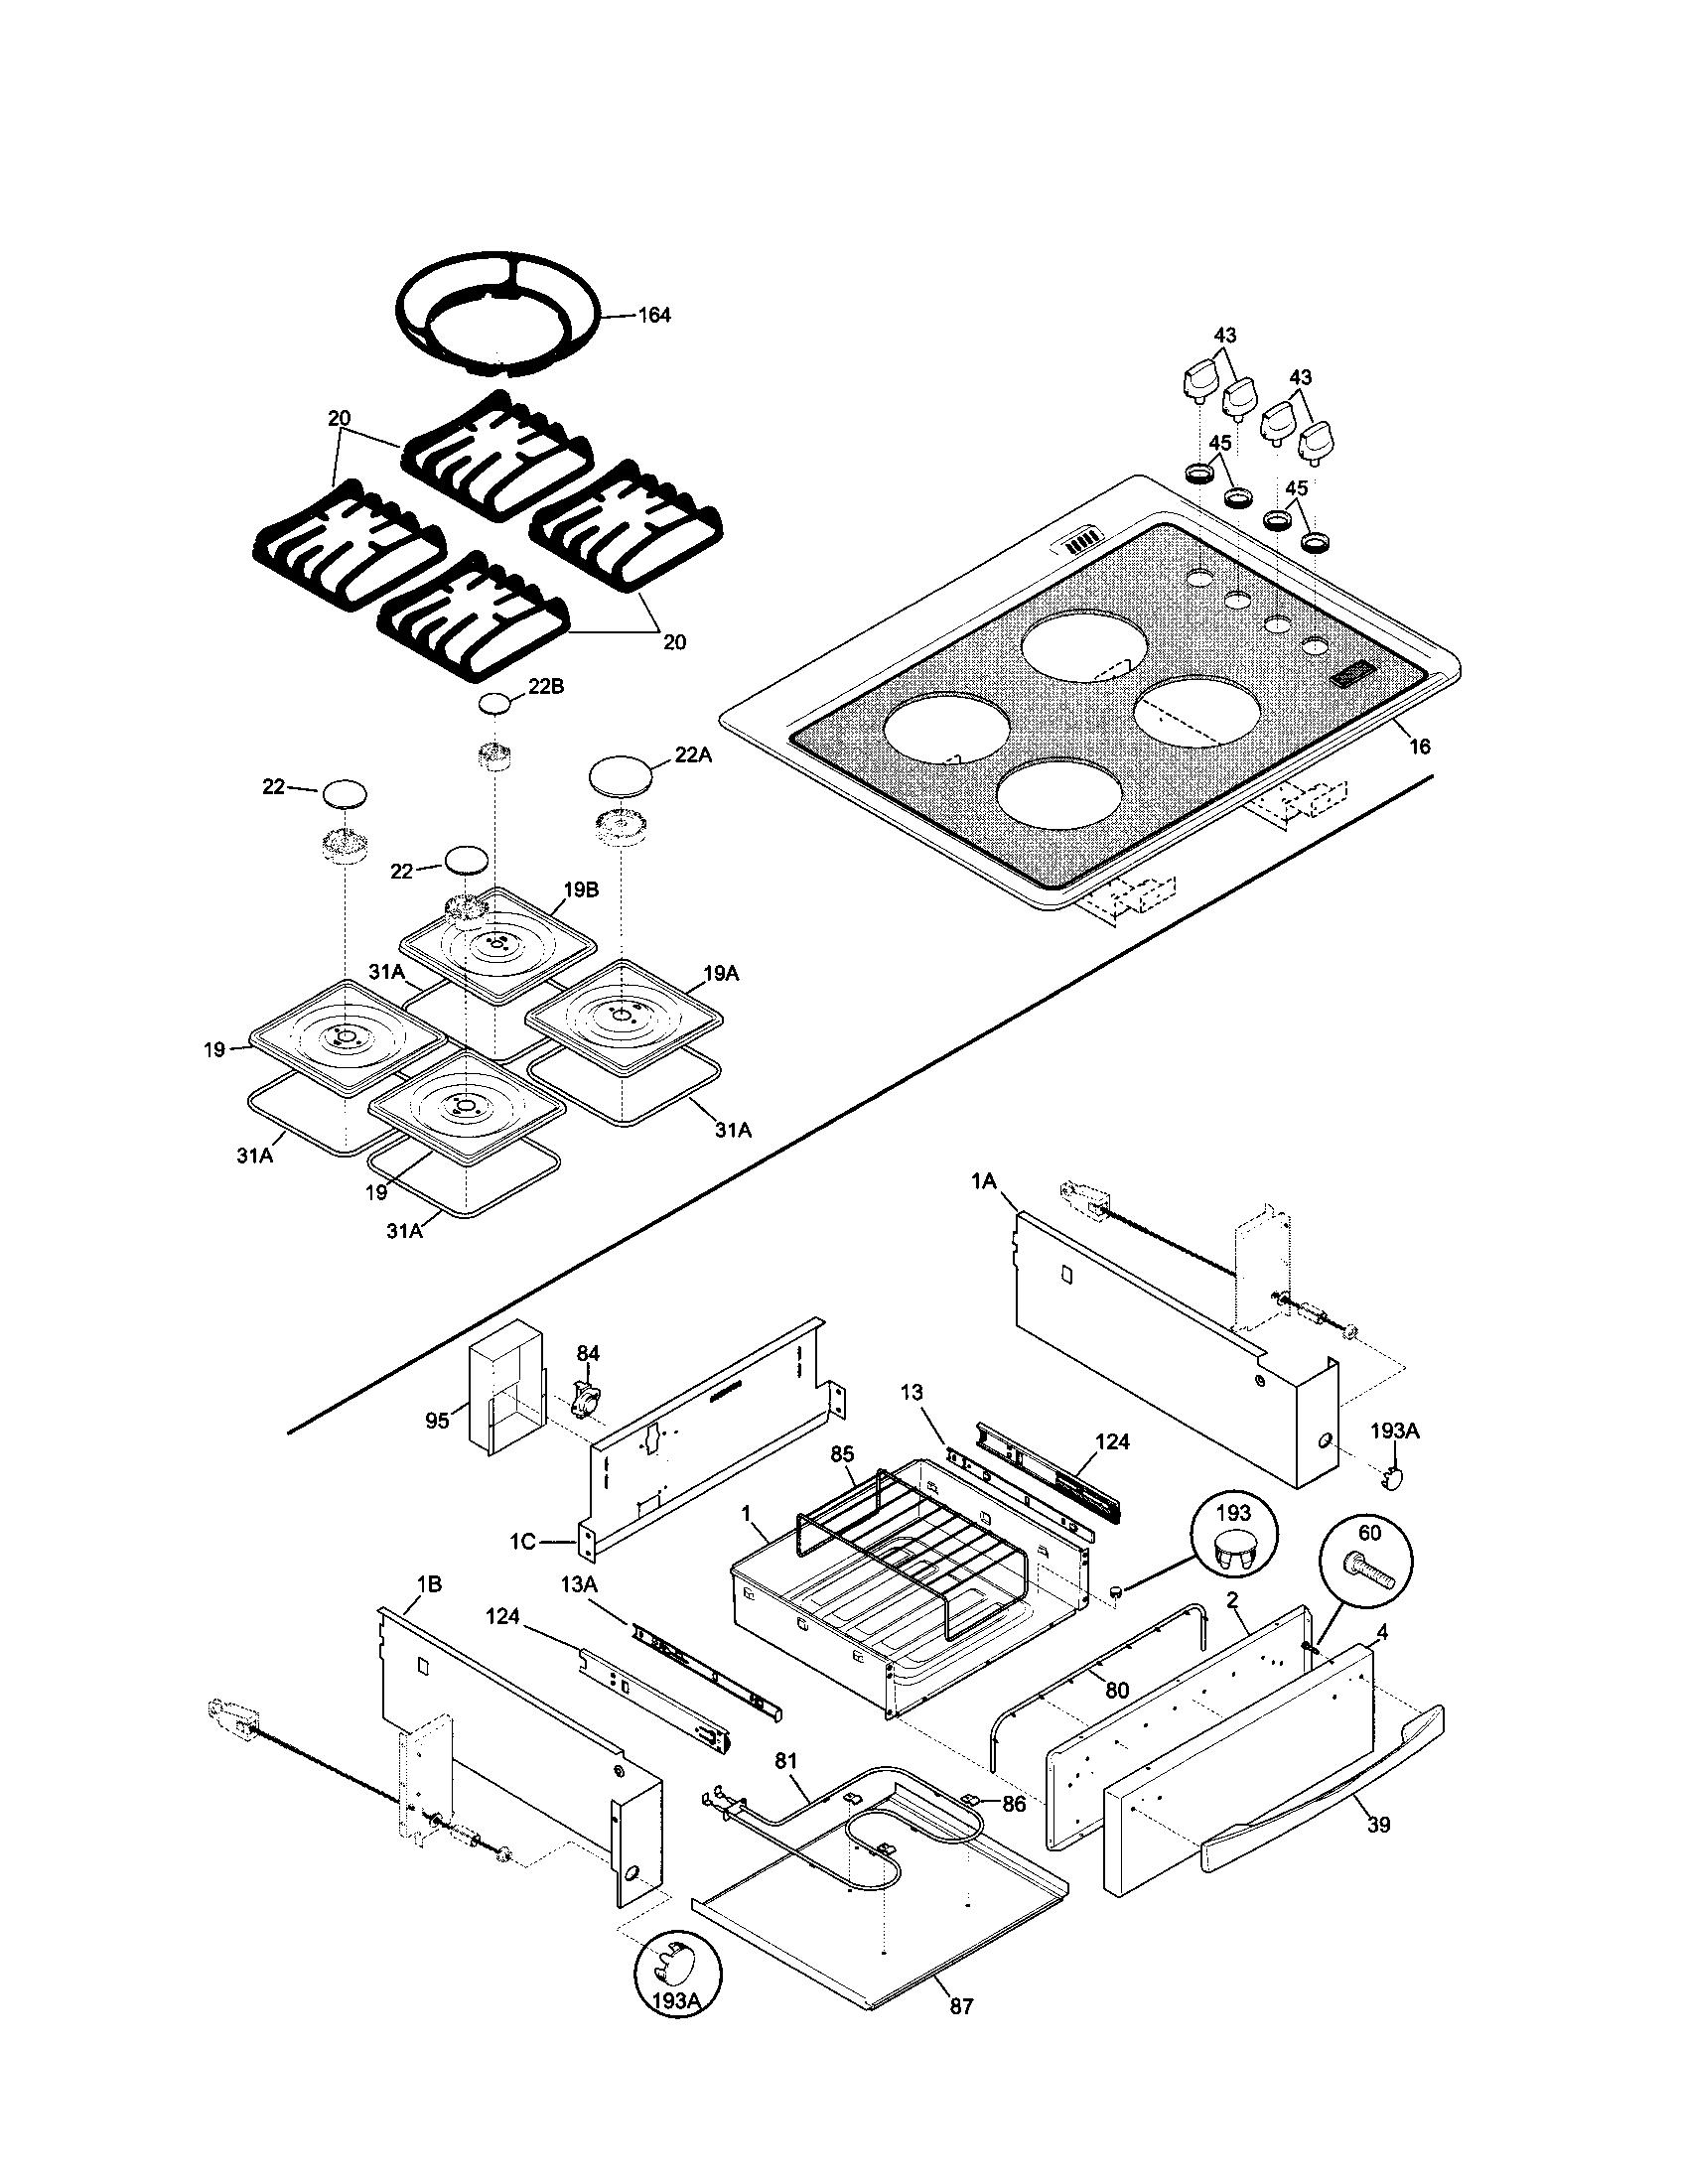 Kenmore Elite Range Dual Fuel Wiring Diagram Kenmore Elite